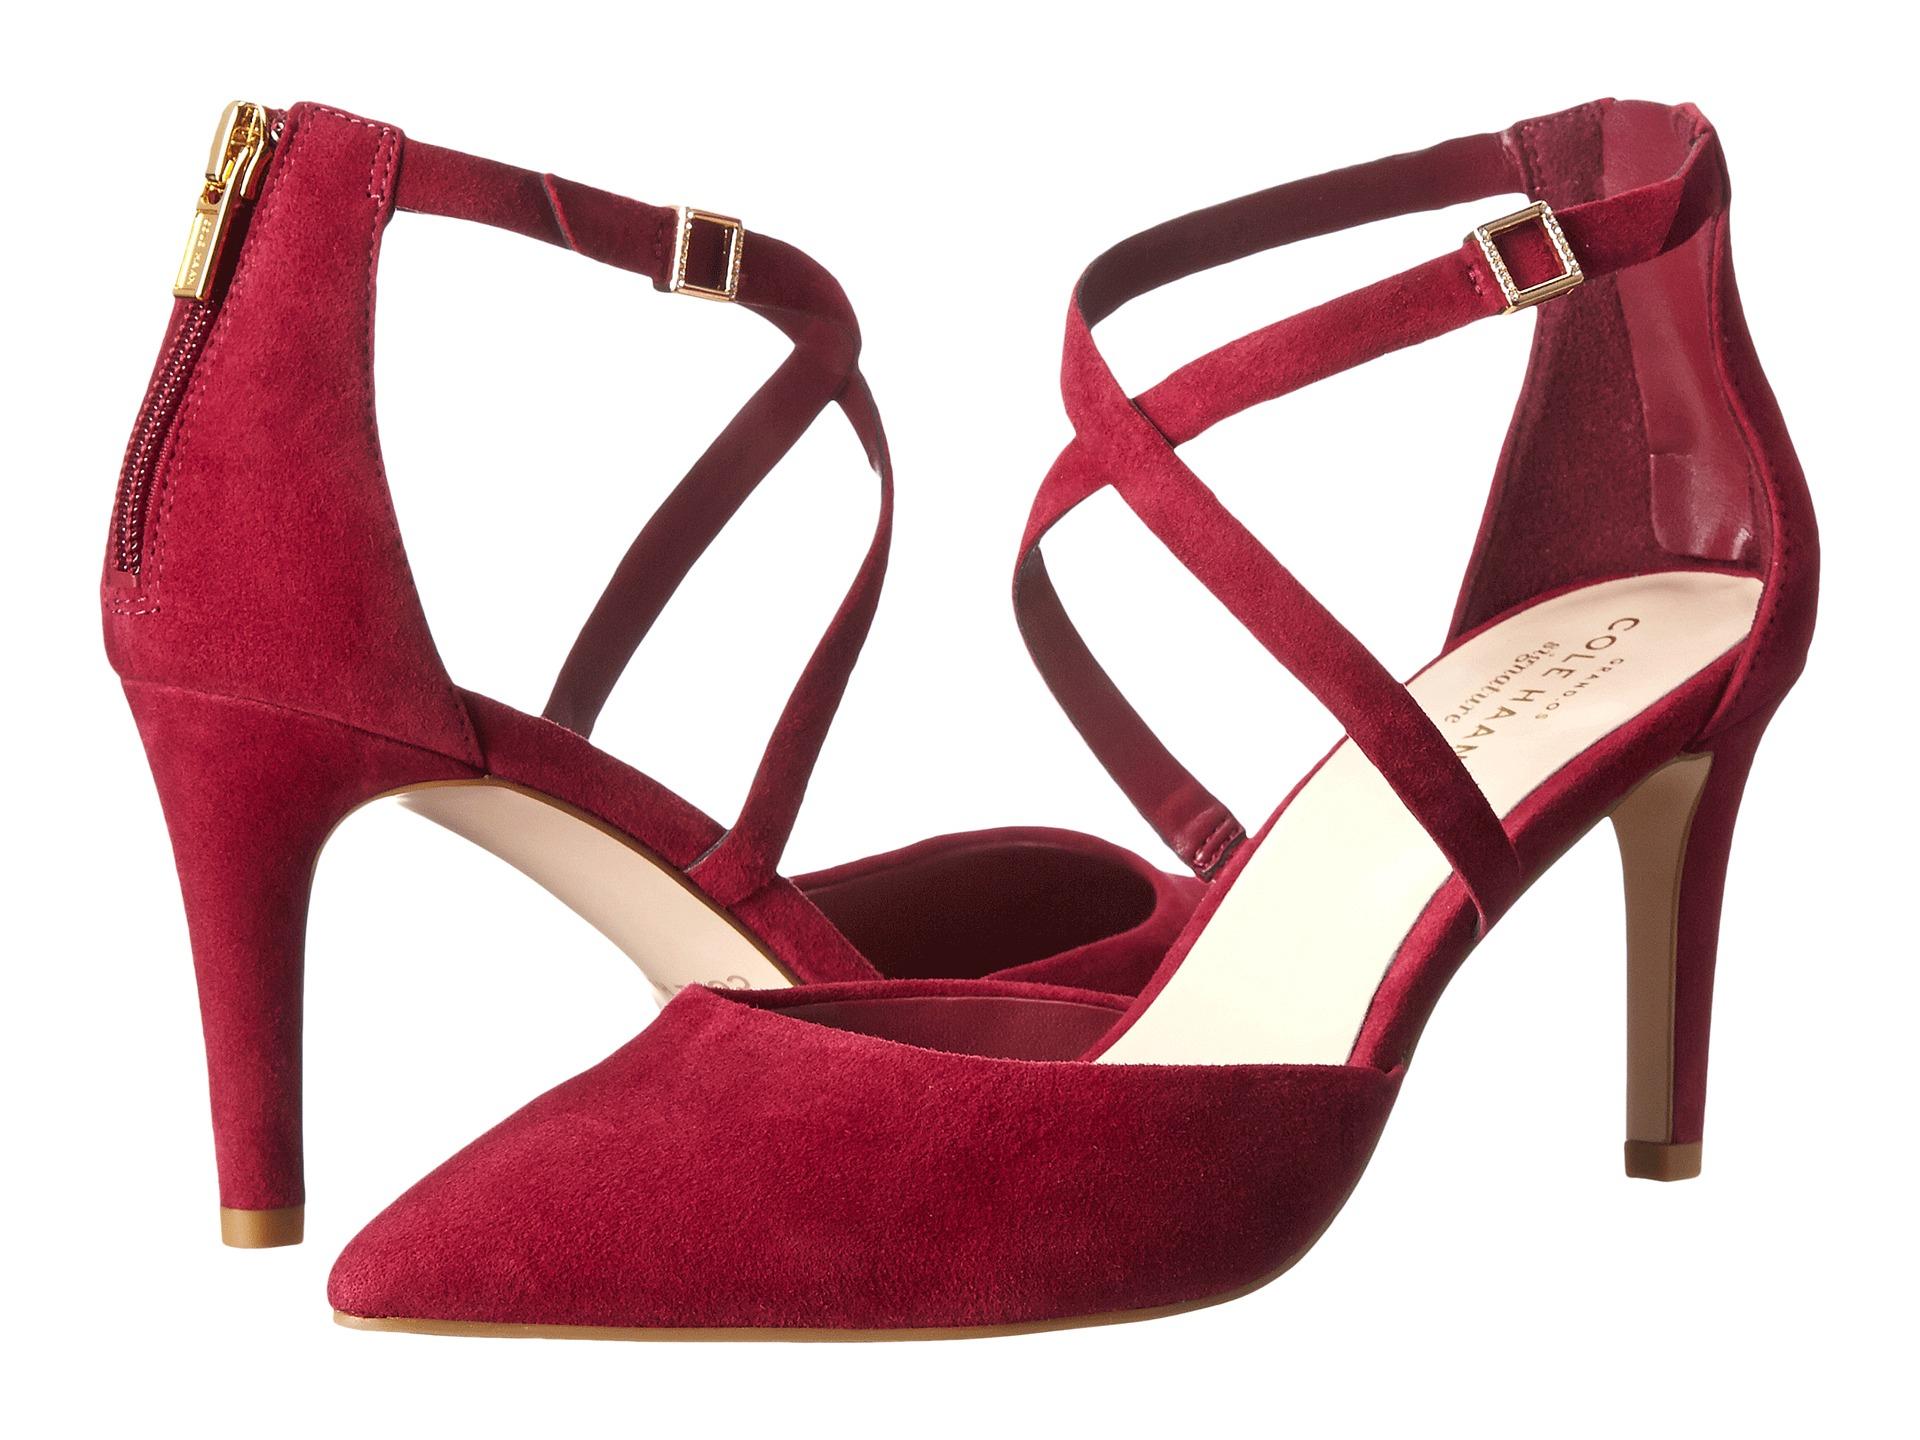 Womens Shoes Cole Haan Juliana Ankle Strap Pump 75 Cabernet Suede